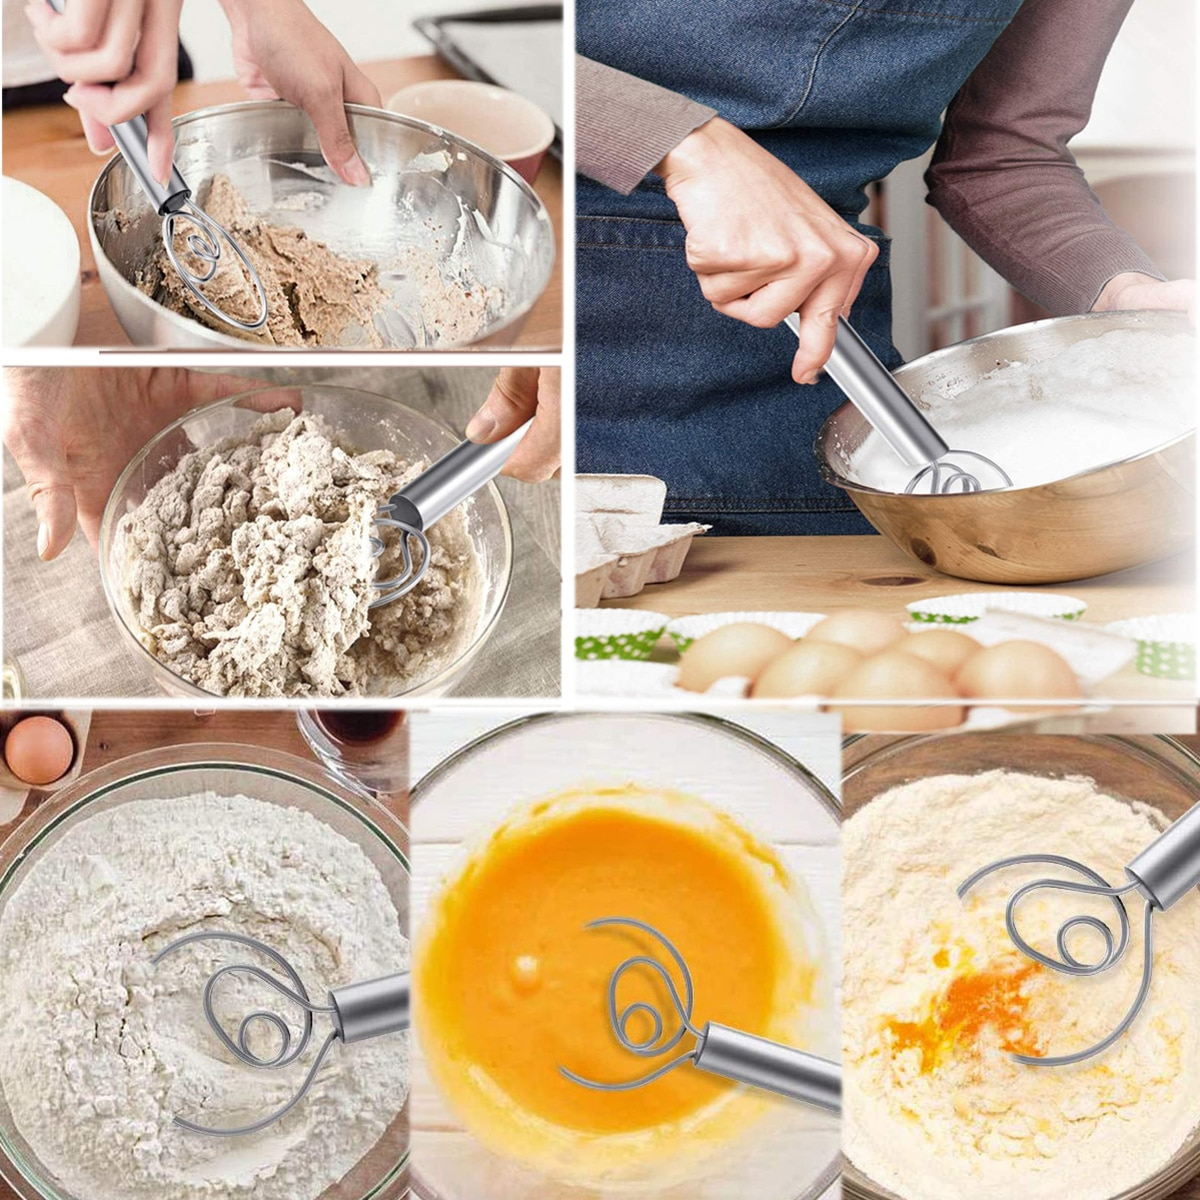 ¡OFERTA 2020! Mezclador de harina de acero inoxidable, batidor de masa danés, agitador de anillo de alambre multifuncional, herramienta de horneado para leche de mermelada de huevo